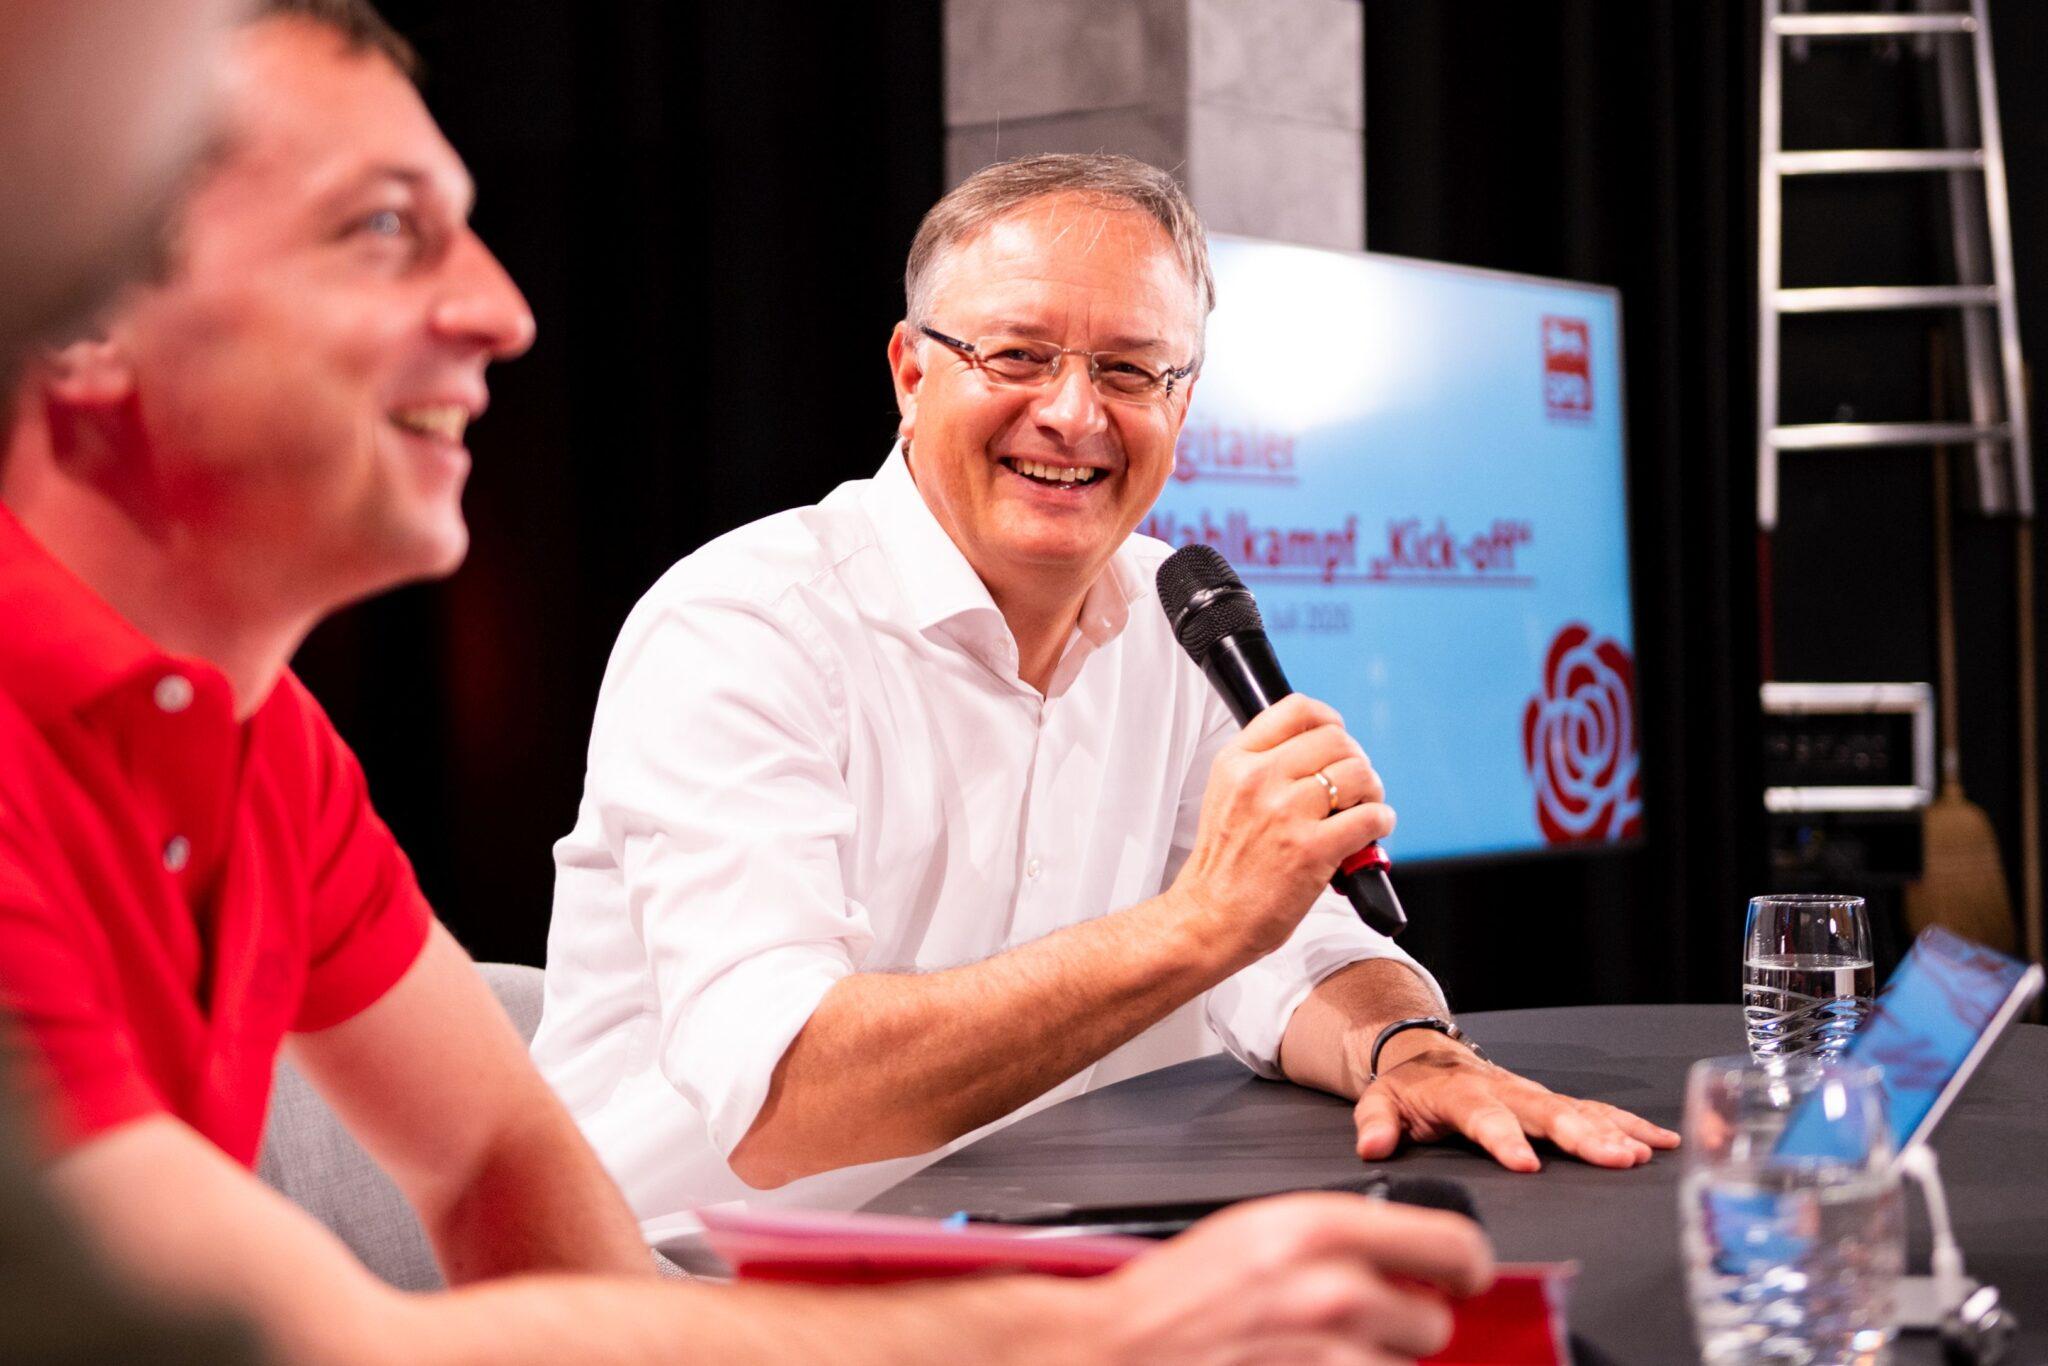 Andreas Stoch freut sich auf Diskussionen. Foto: pm